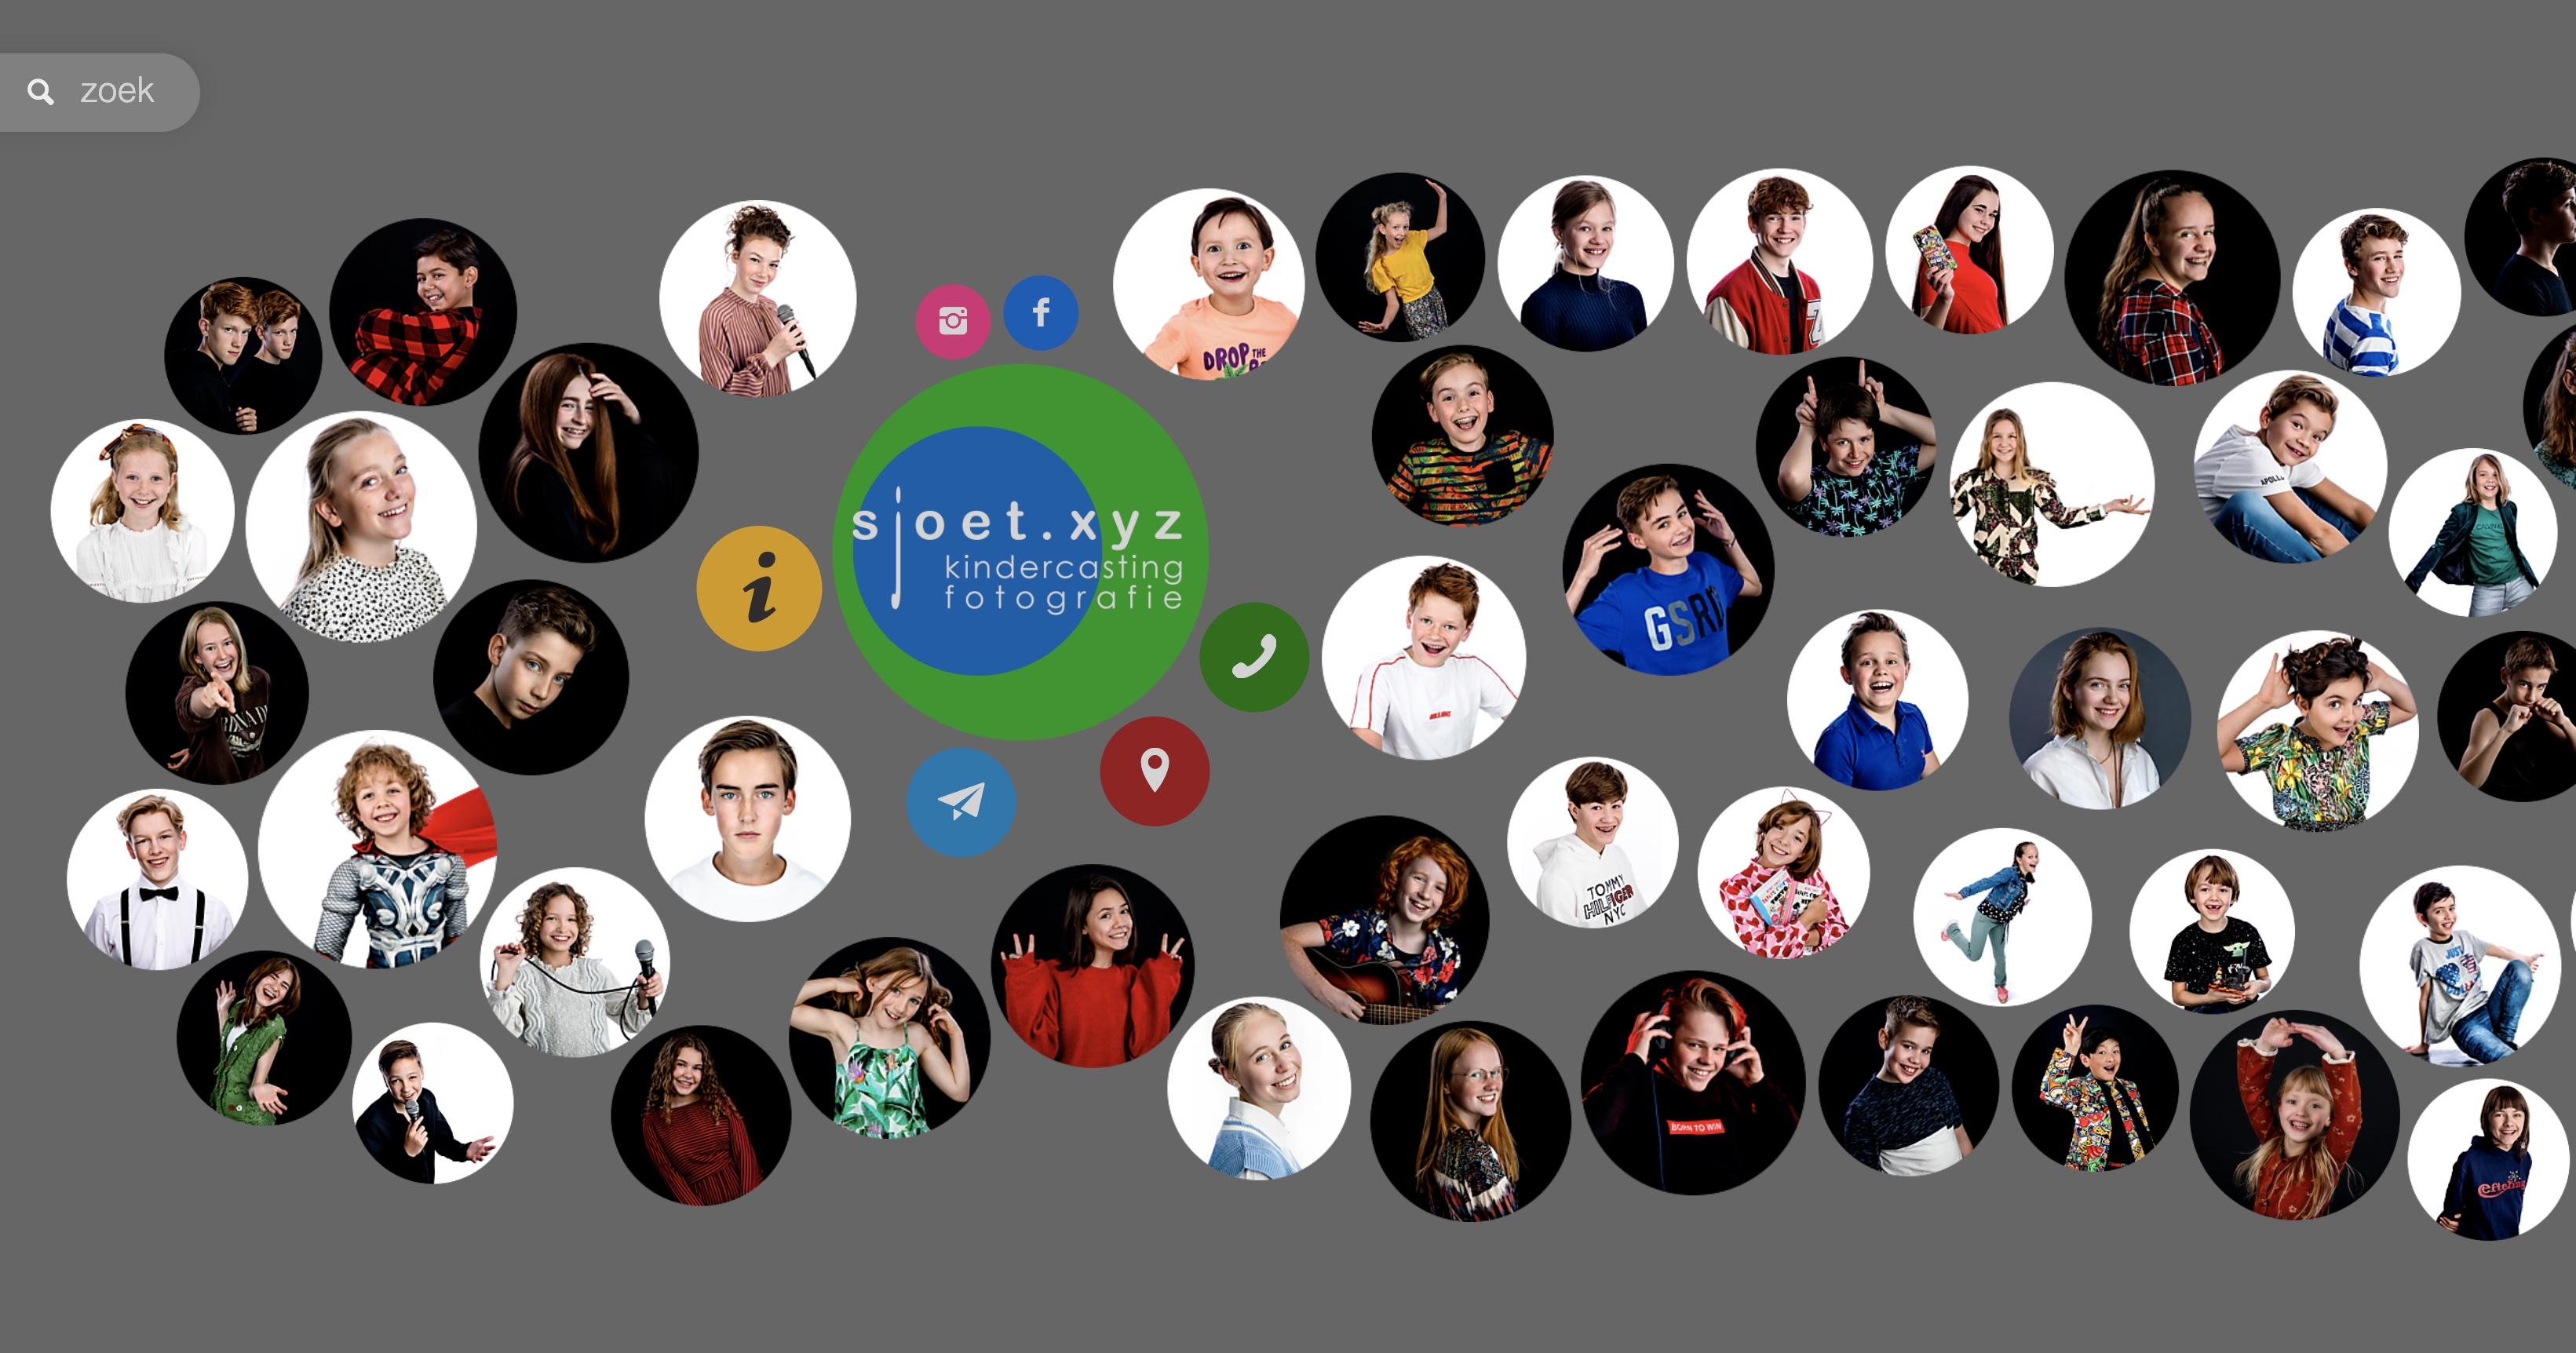 Sjoet.xyz | Kindercasting Fotografie